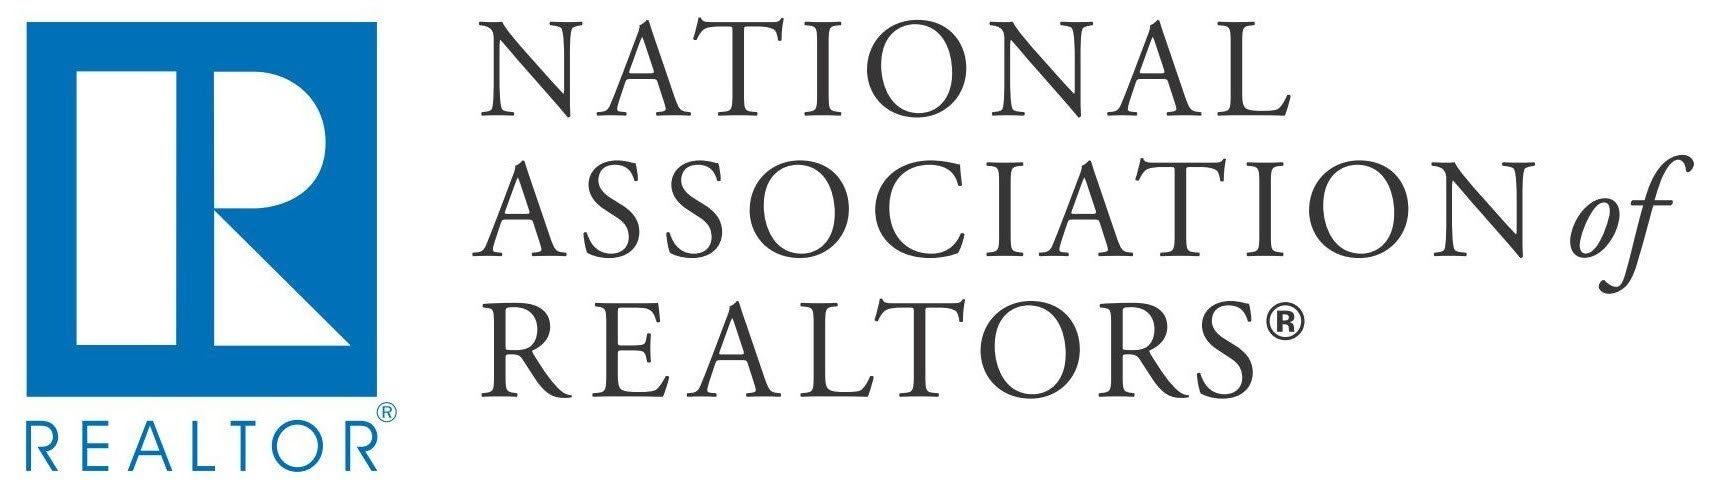 Colorado Real Estate Sherri Bond Presidents' Elite Award Winning Realtor